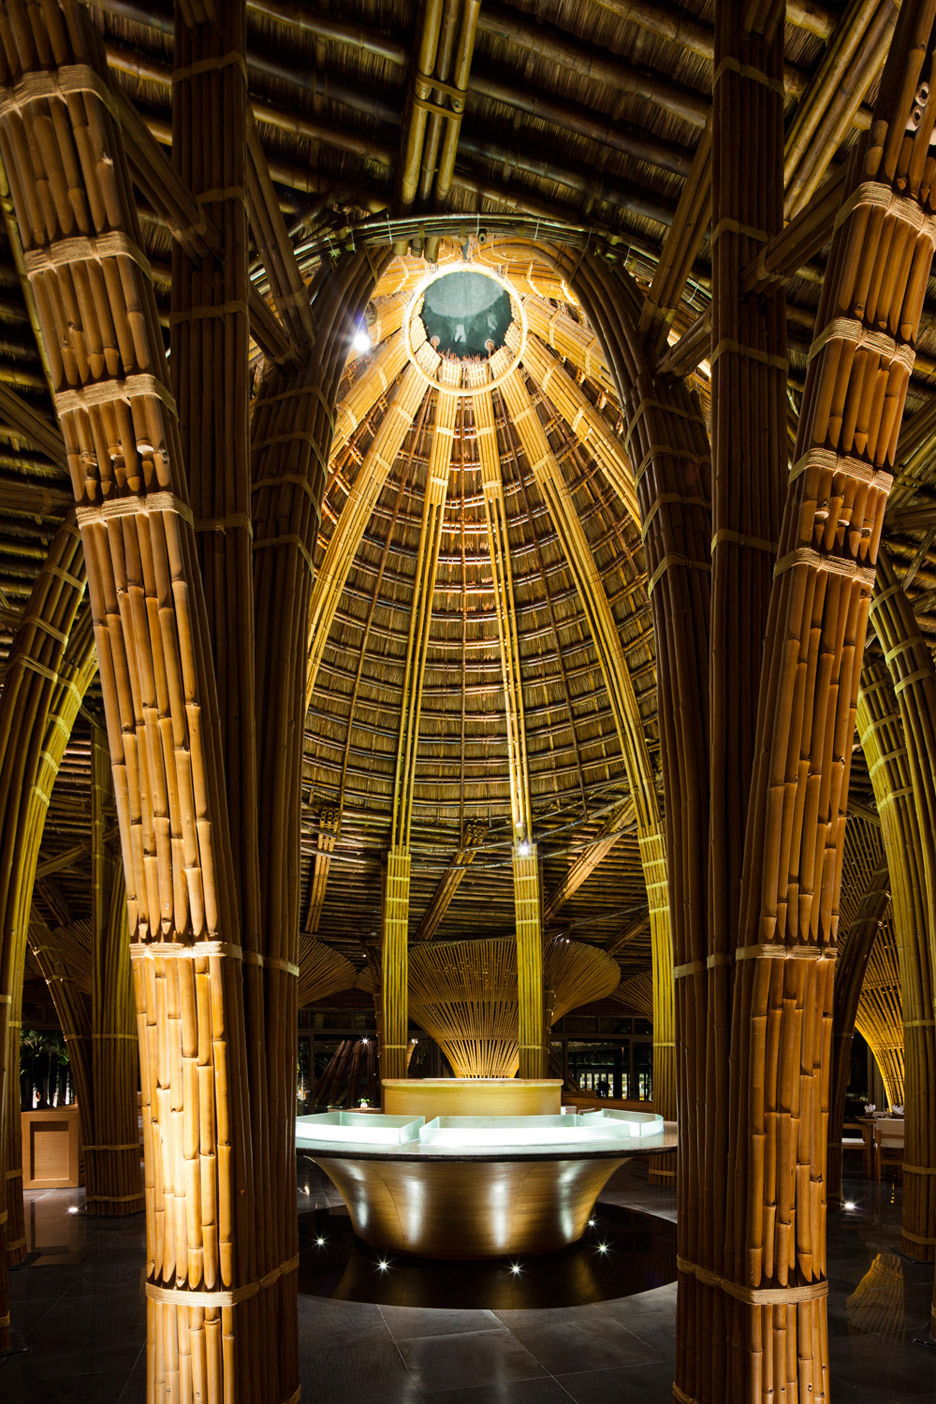 arquitetura-sustentavel-com-bambu-em-resort-no-vietna-hiroyuki-blog-usenatureza